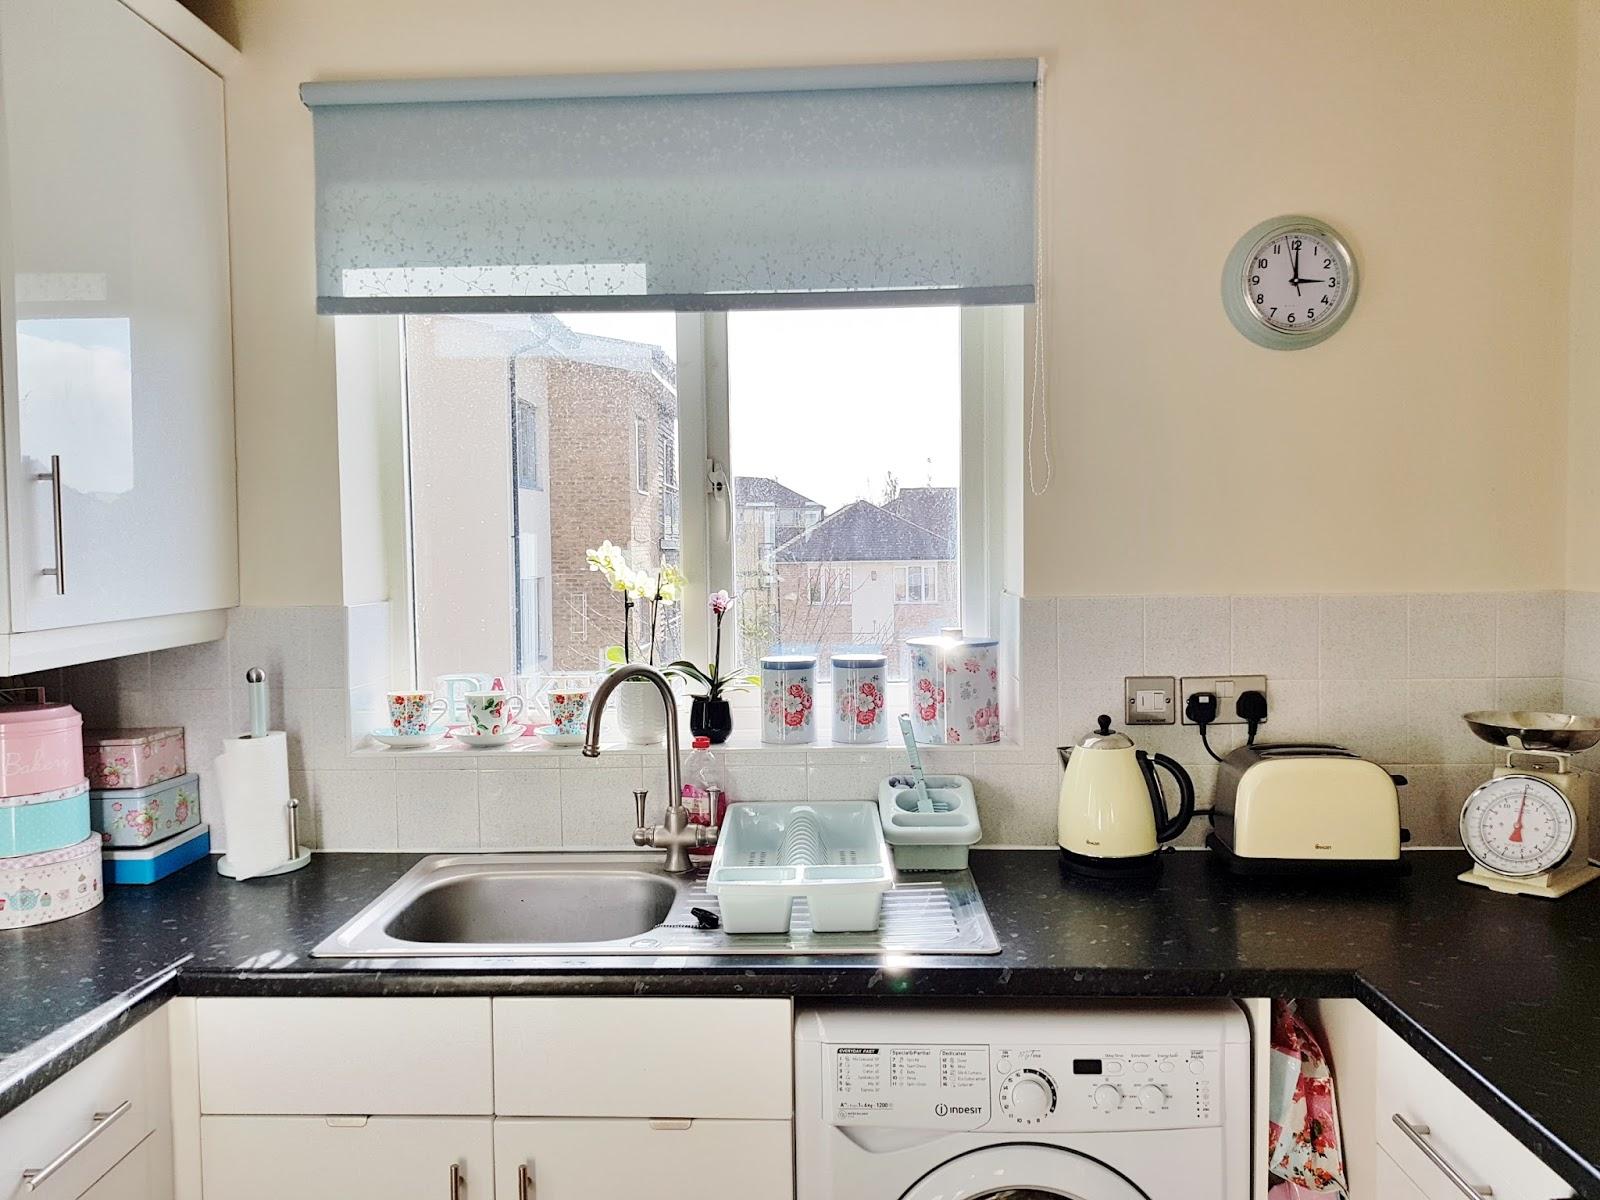 My First Home: The Kitchen | Victoria\'s Vintage Blog